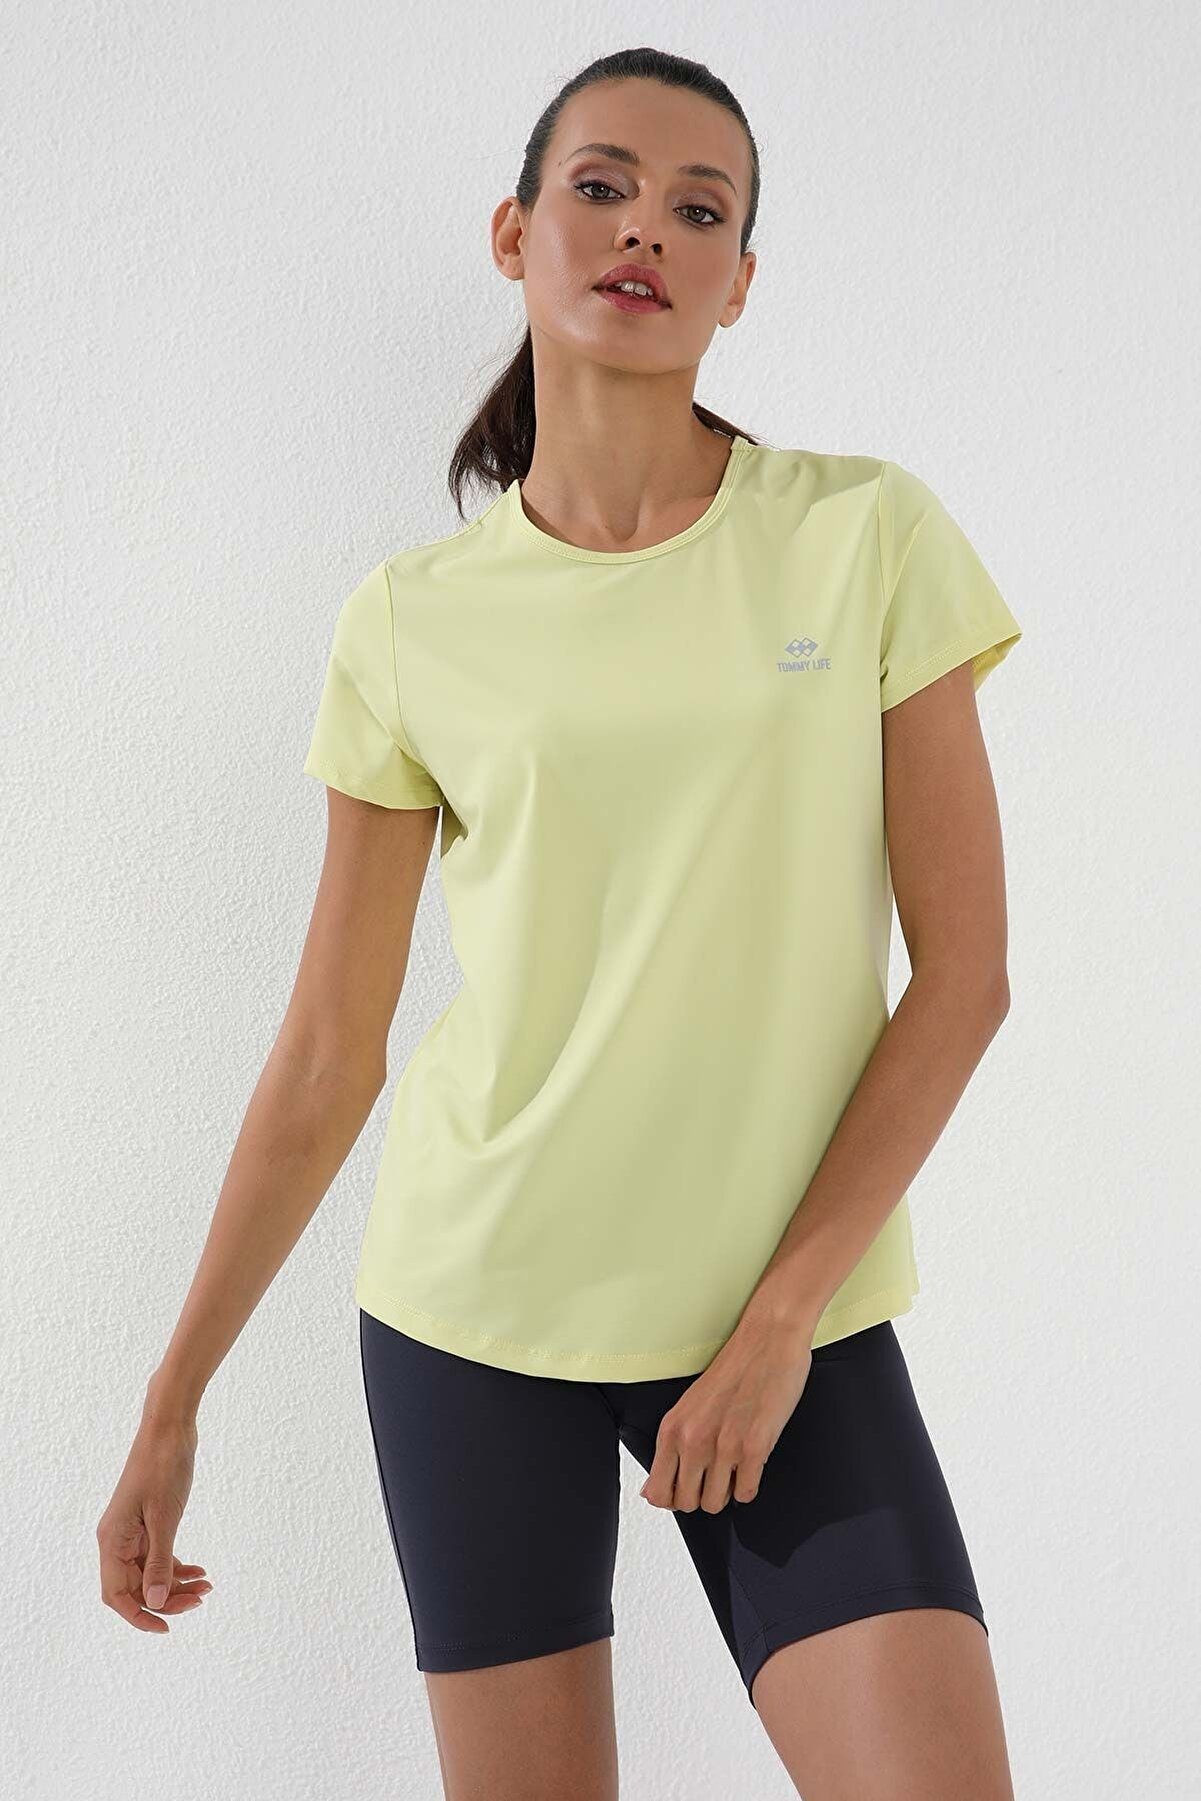 Tommy Life Limon Kadın Basic Kısa Kol Standart Kalıp O Yaka T-shirt - 97144